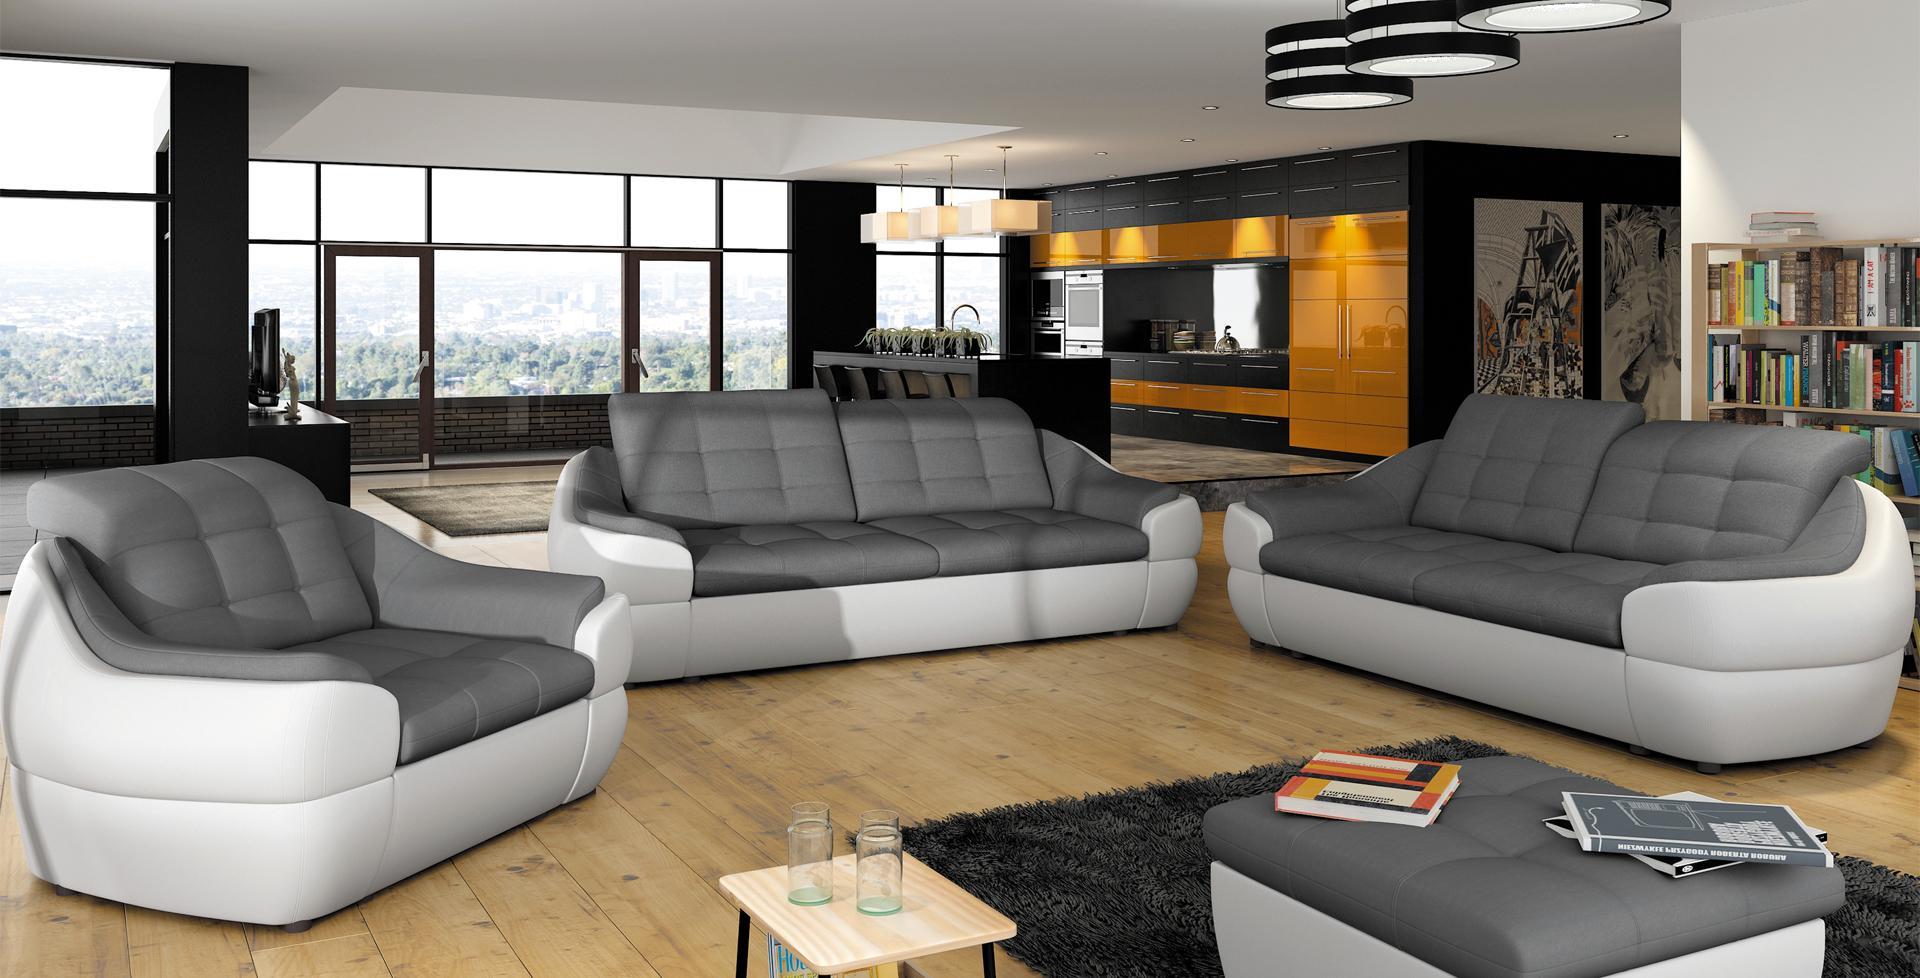 Full Size of Couchgarnitur 3 2 1 Sitzer Chesterfield Sofa Superior Samt Emma 3 2 1 Sitzer Big Emma Sofagarnitur Couch Garnitur Mit Relafunktion Alternatives Canape Bett Sofa Sofa 3 2 1 Sitzer